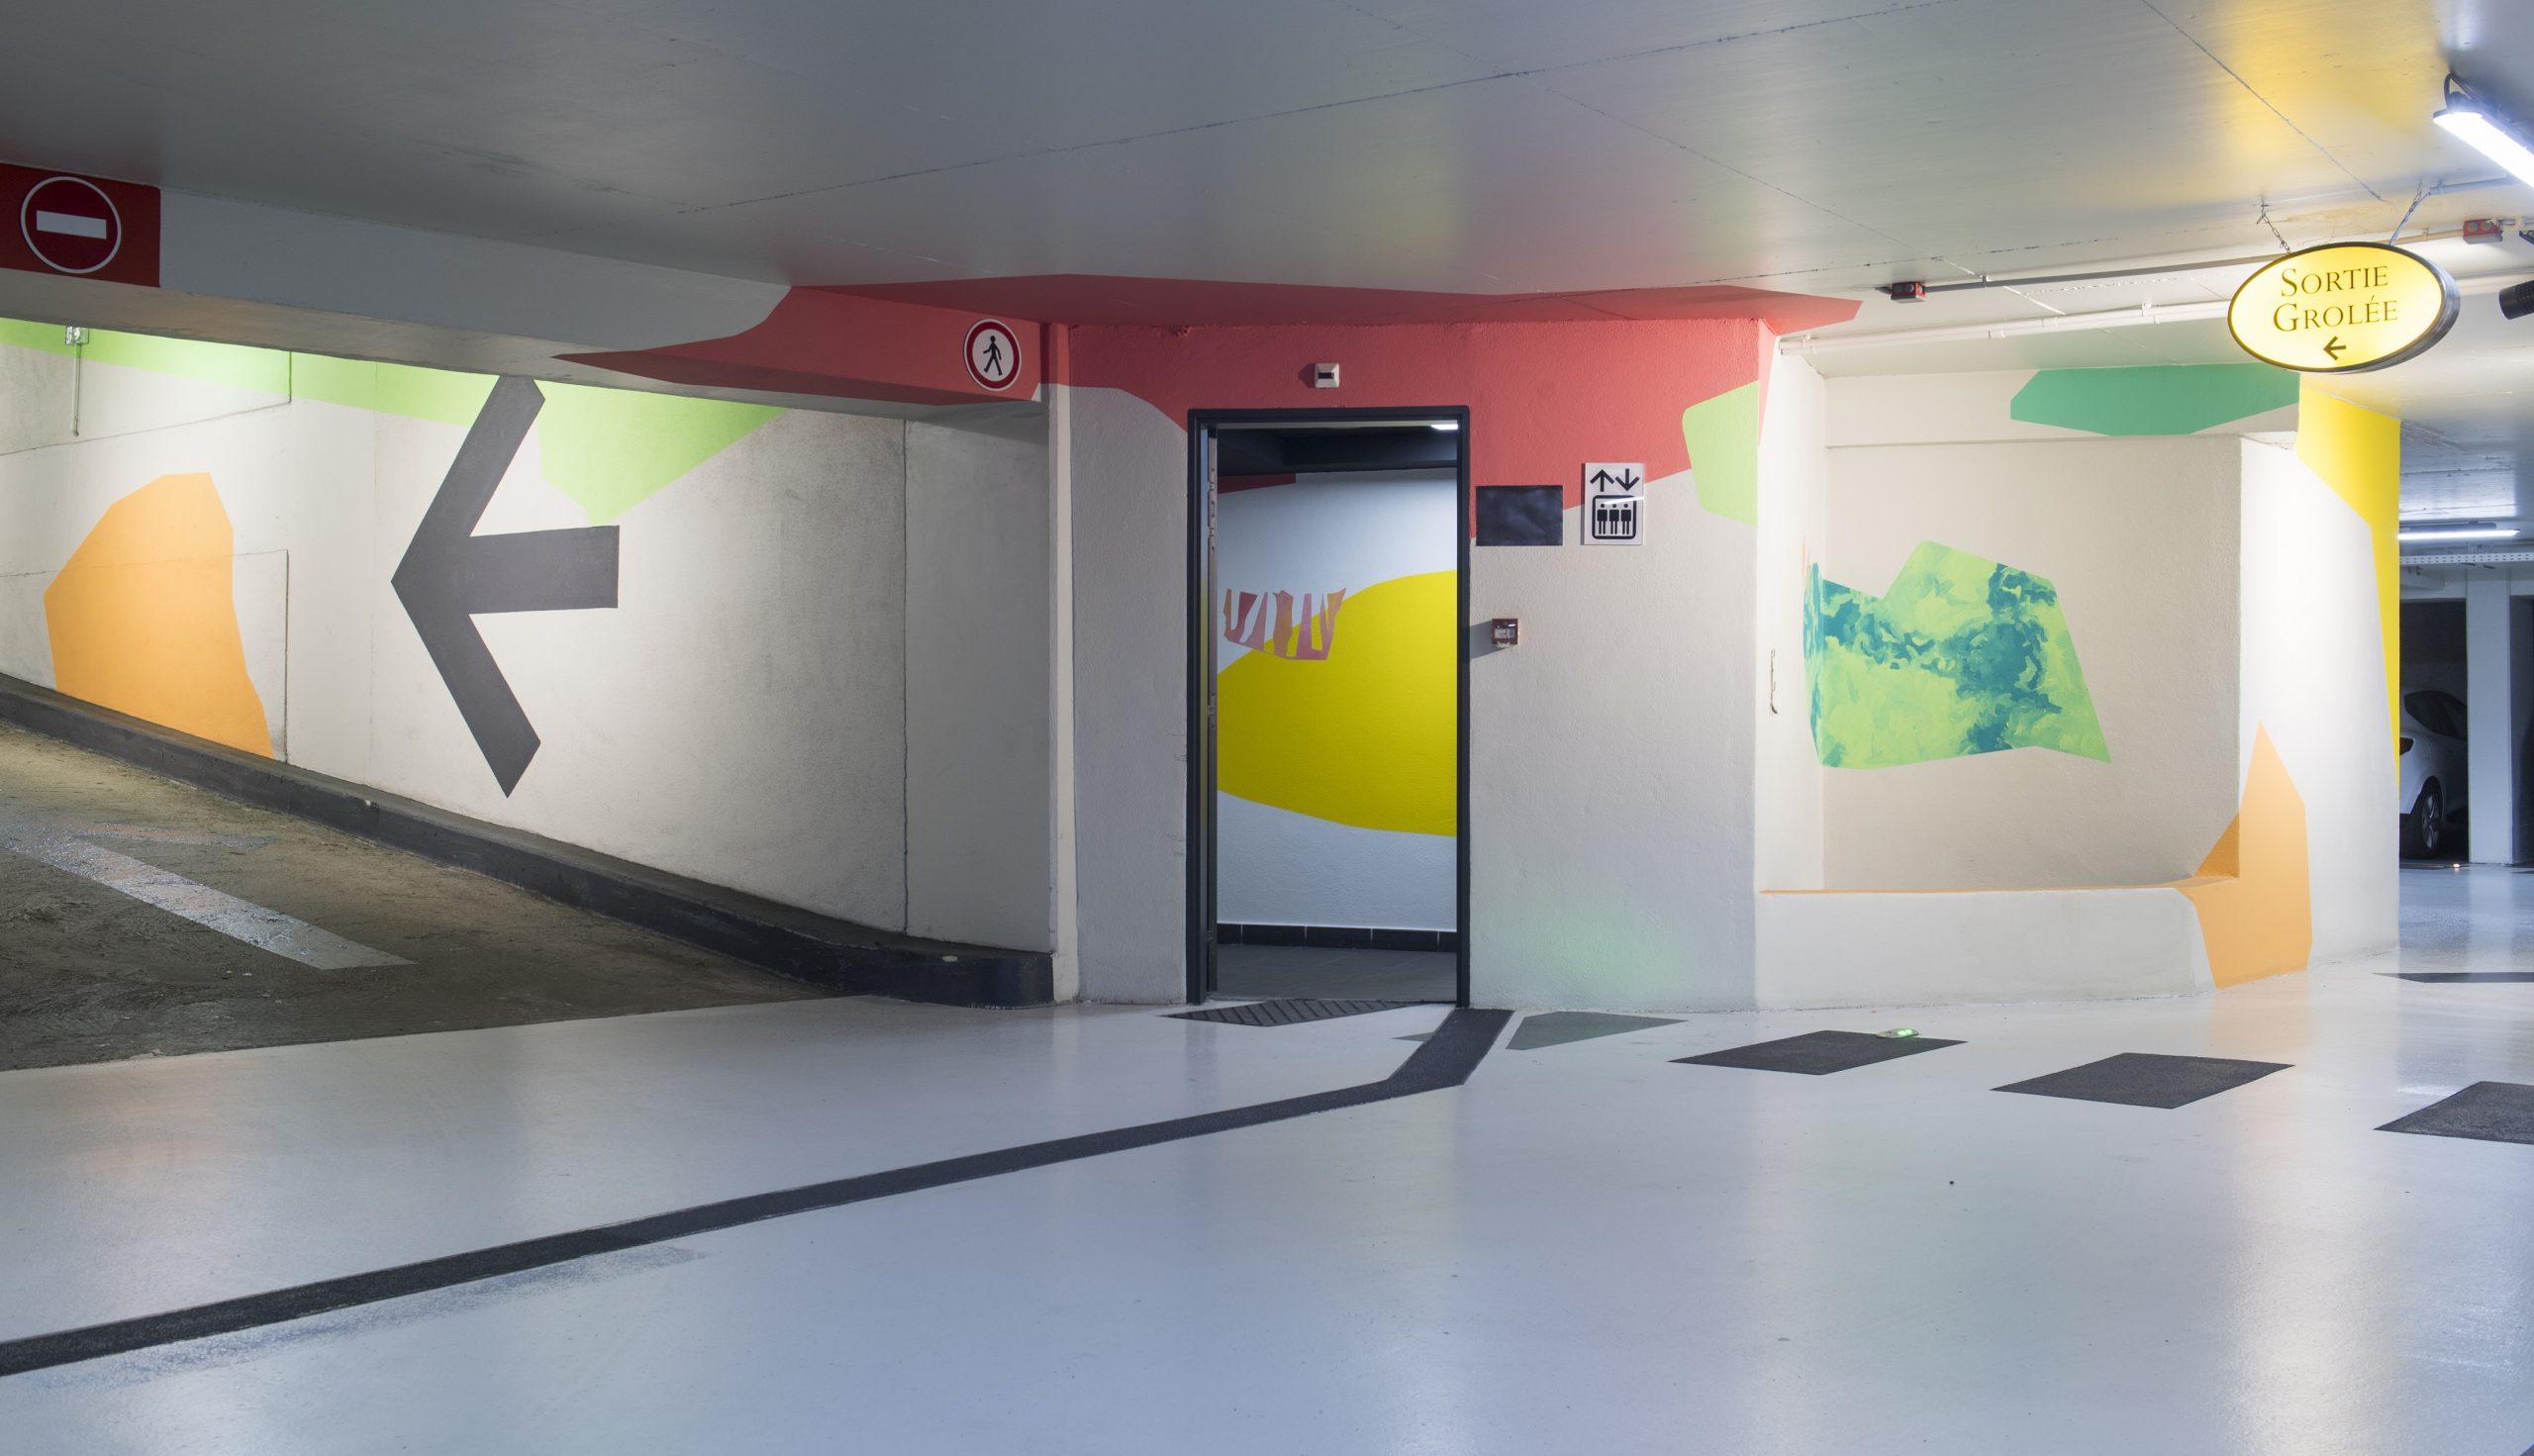 Parking LPA Grolée